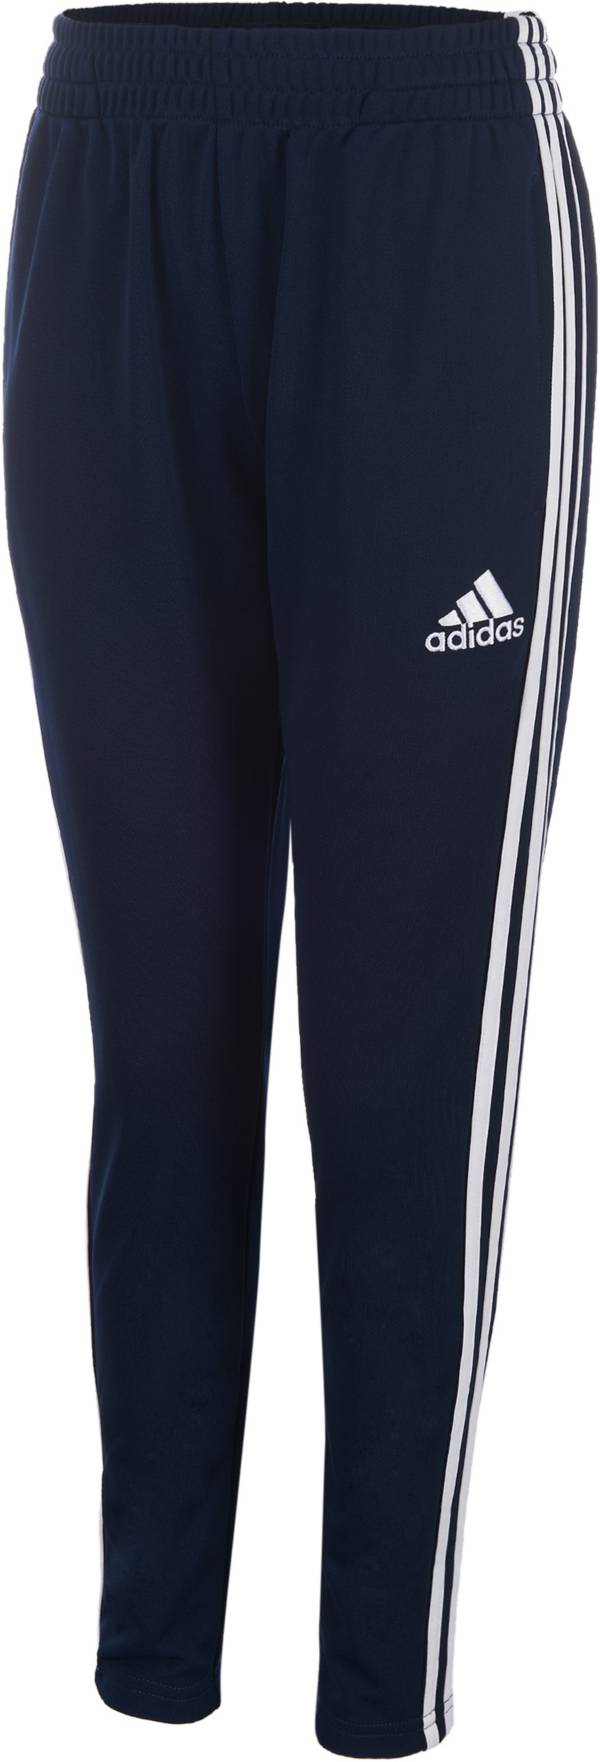 adidas Boys' Trainer Pants product image